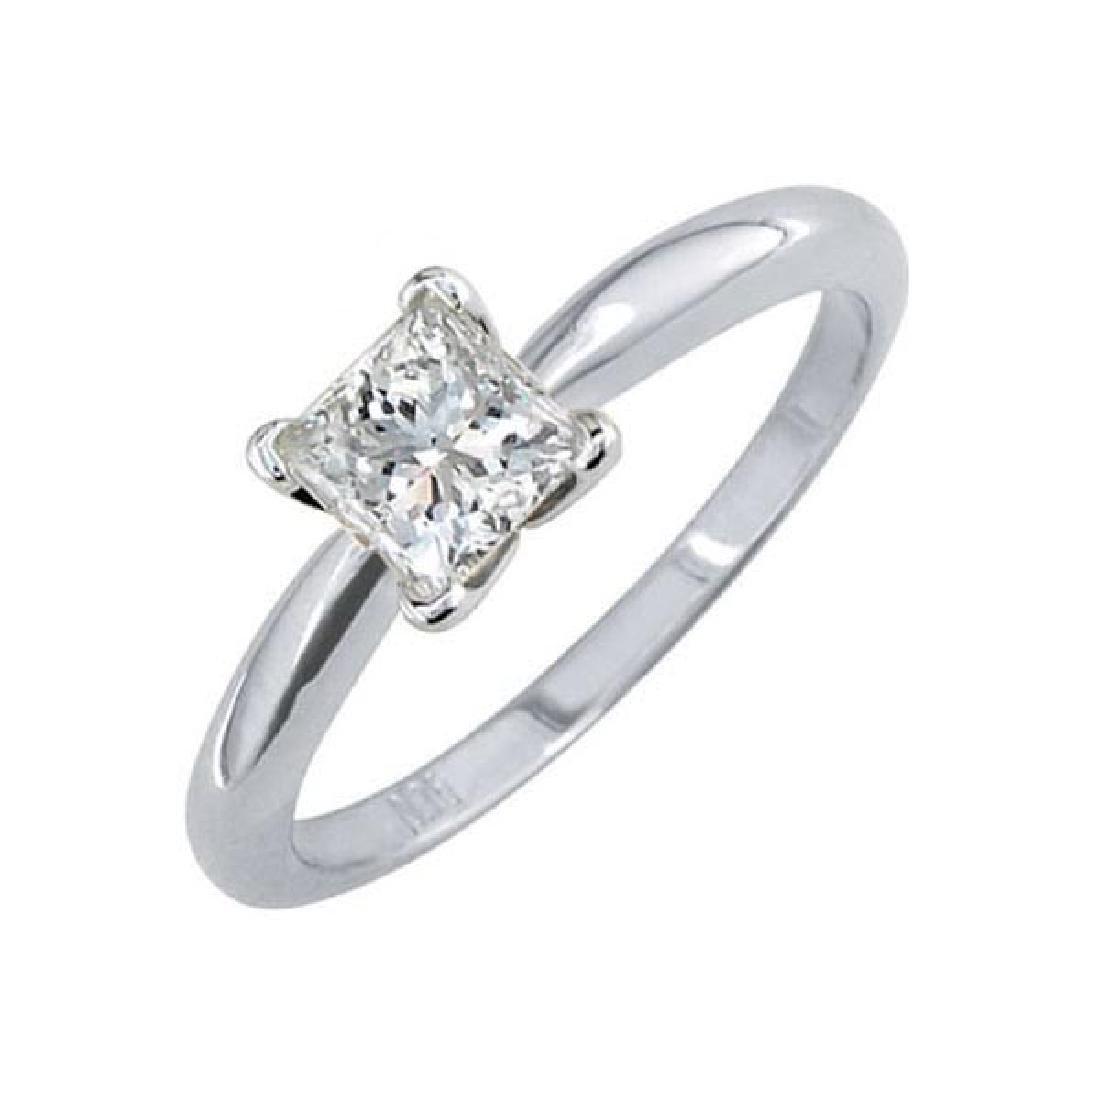 Certified 0.67 CTW Princess Diamond Solitaire 14k Ring